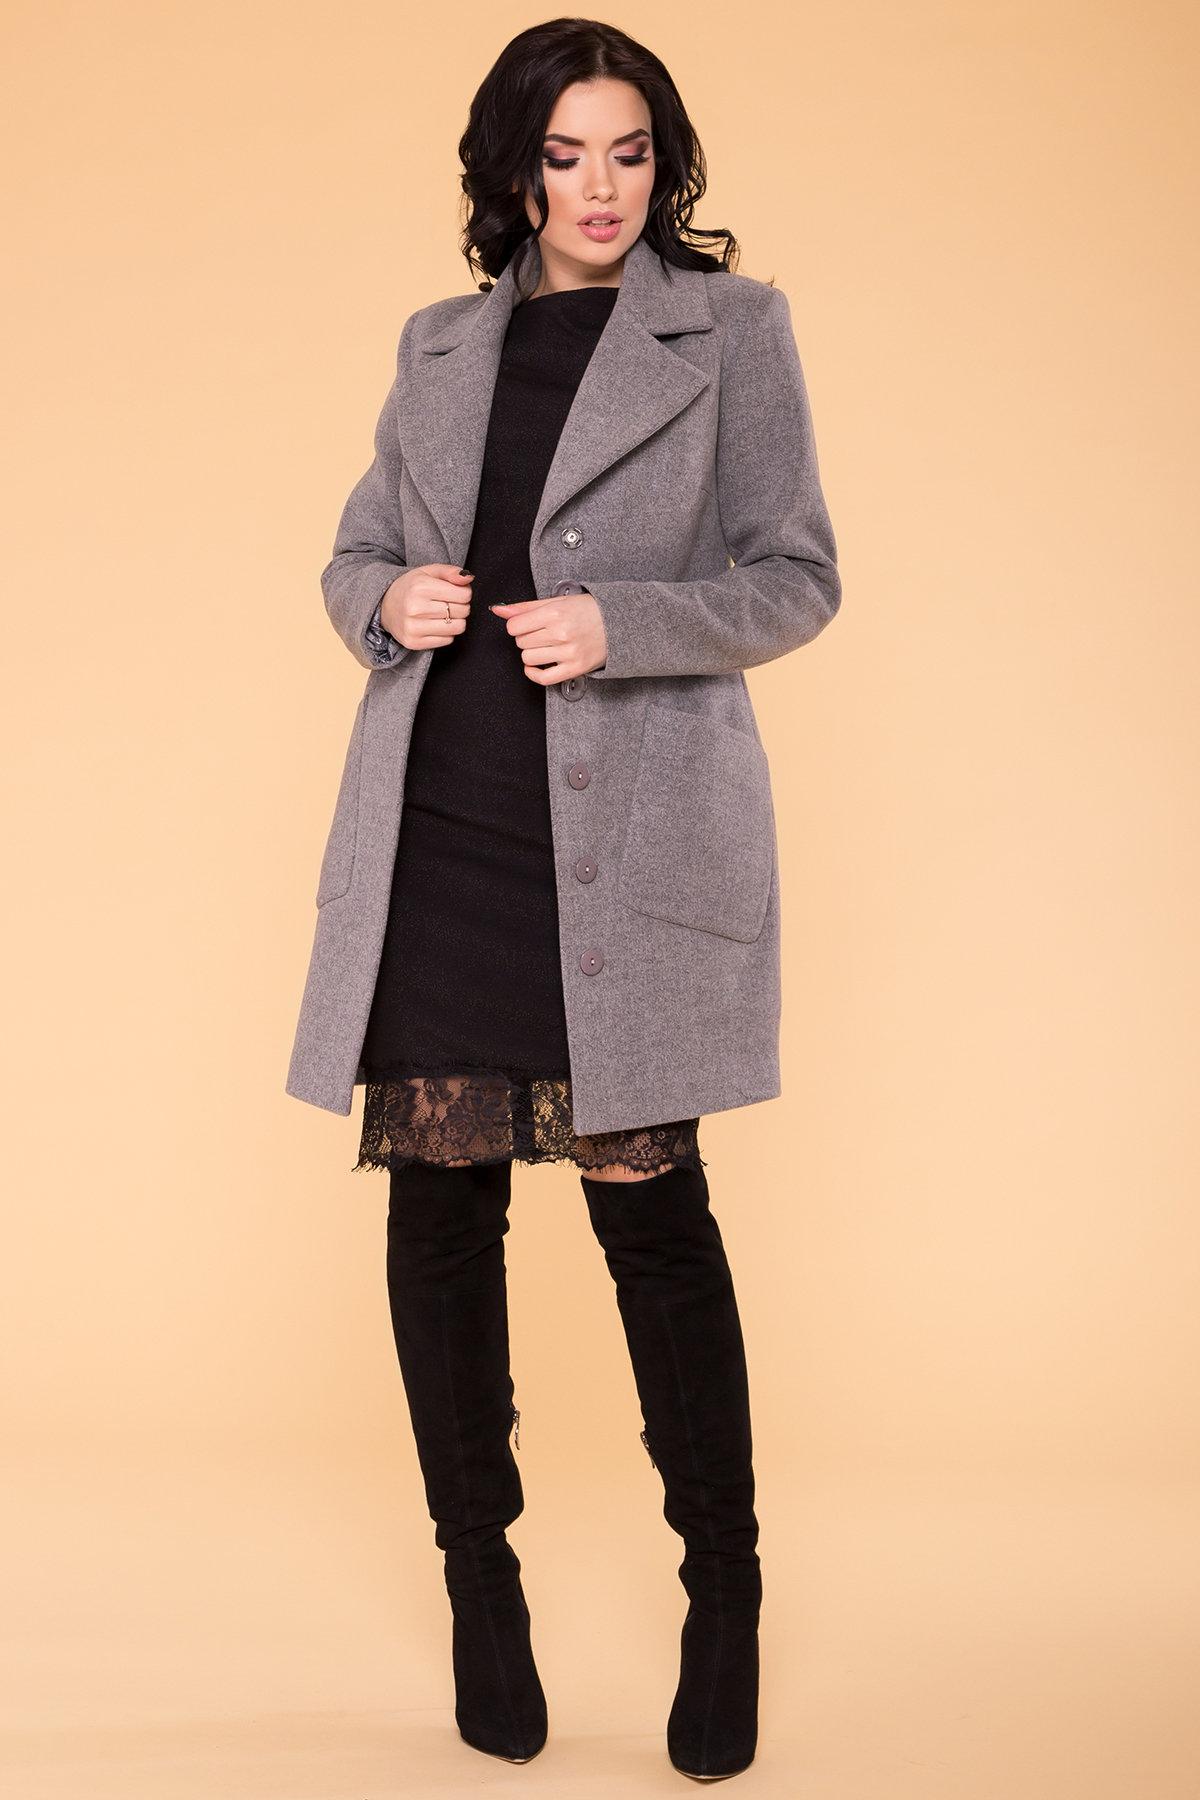 Пальто Габриэлла 4417 АРТ. 21204 Цвет: Серый 18 - фото 3, интернет магазин tm-modus.ru